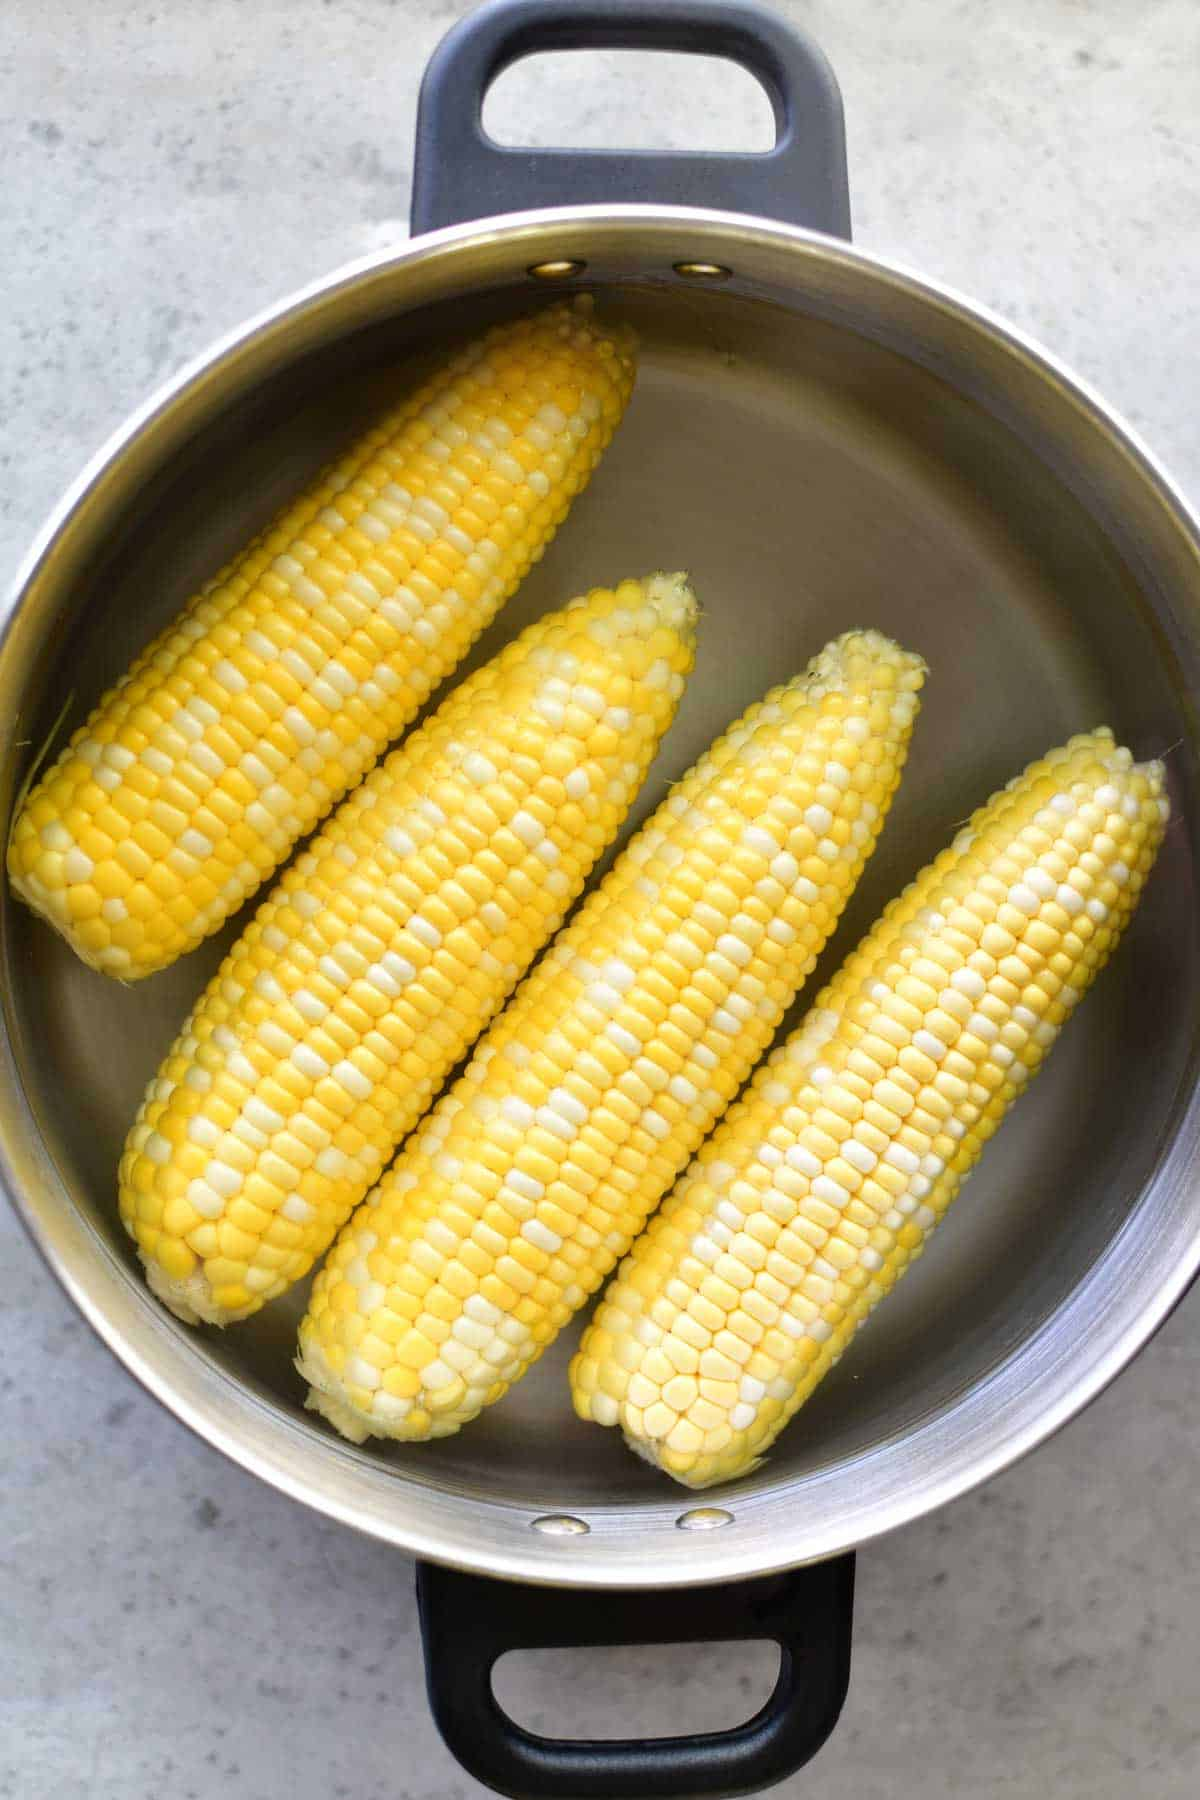 Boiled Corn On The Cob - The Gunny Sack